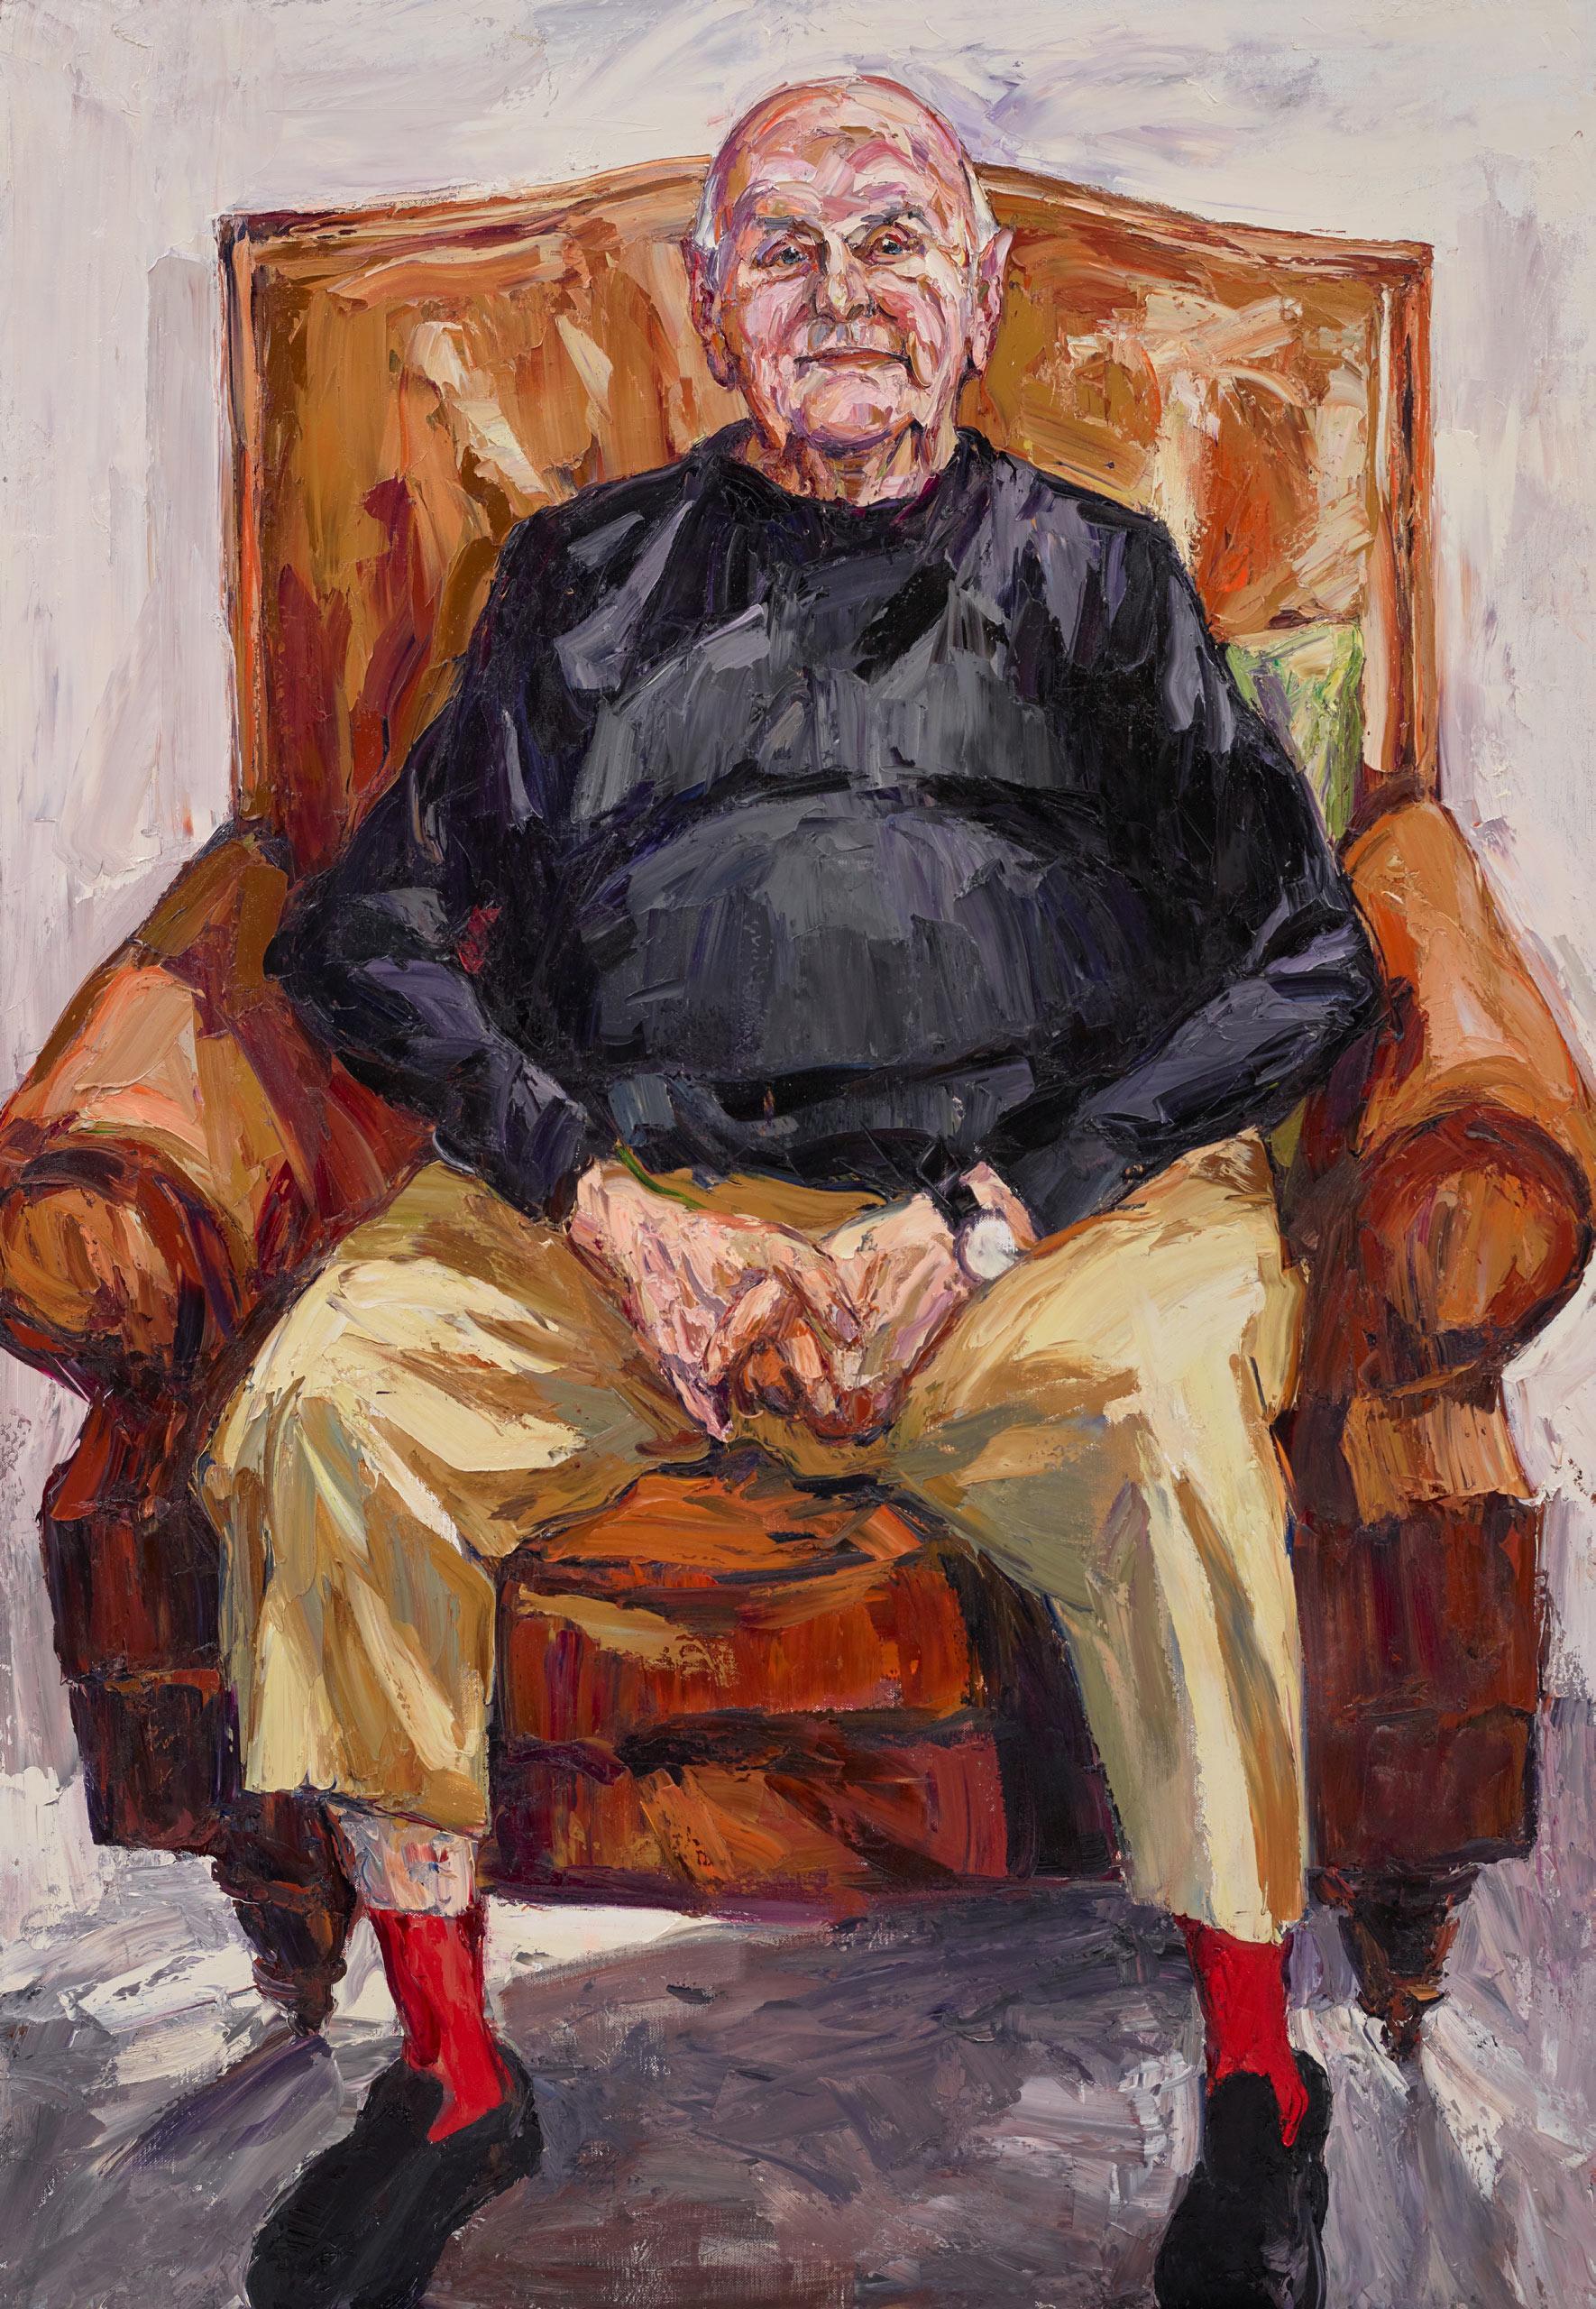 Nicholas Harding John Olsen Ao Obe Archibald Prize